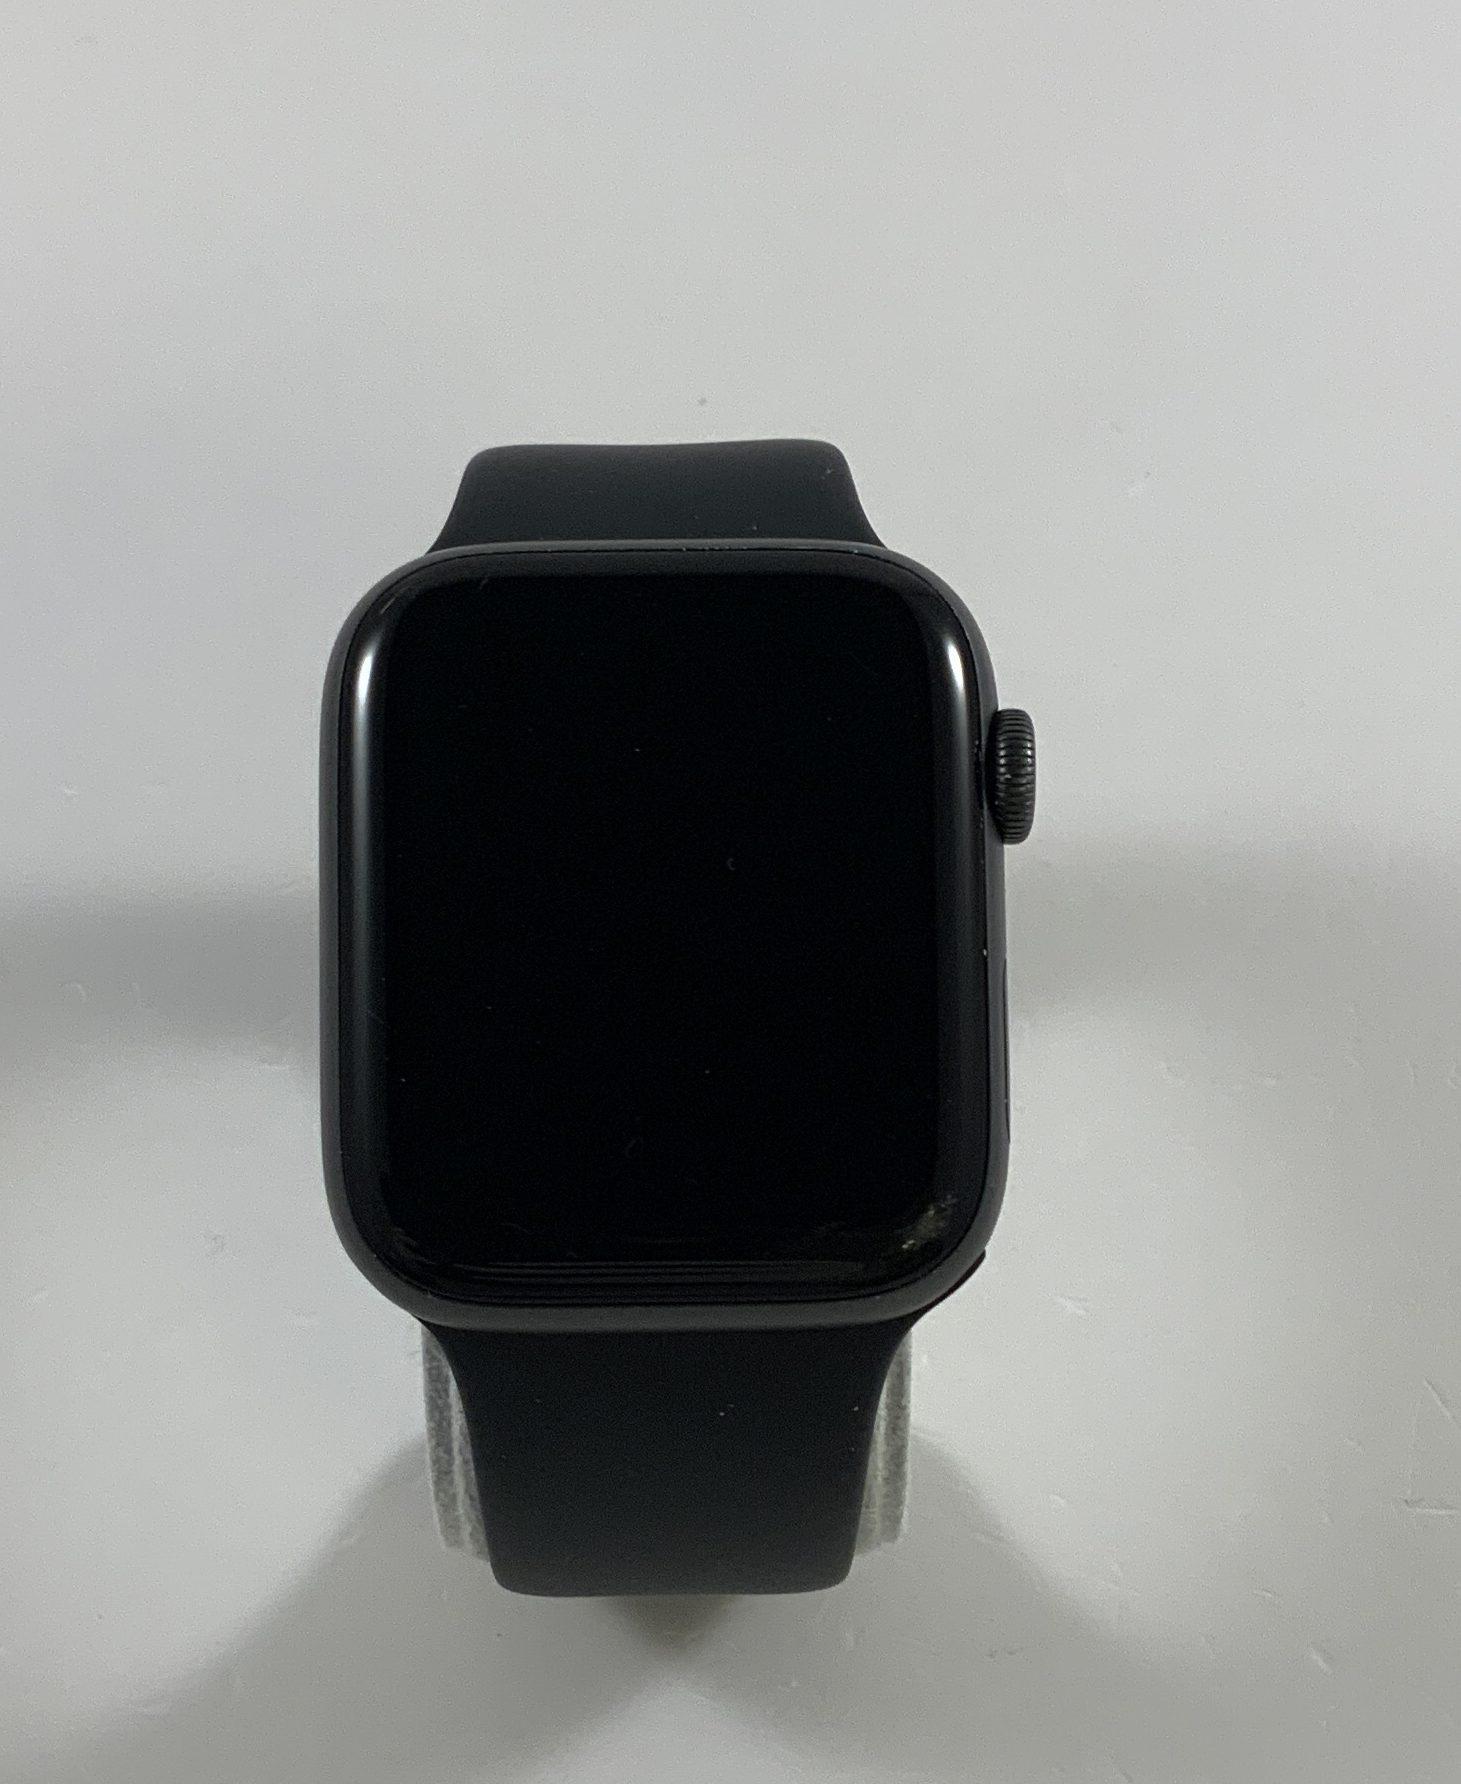 Watch Series 4 Aluminum Cellular (44mm), Space Gray, Black Sport Band, Kuva 1